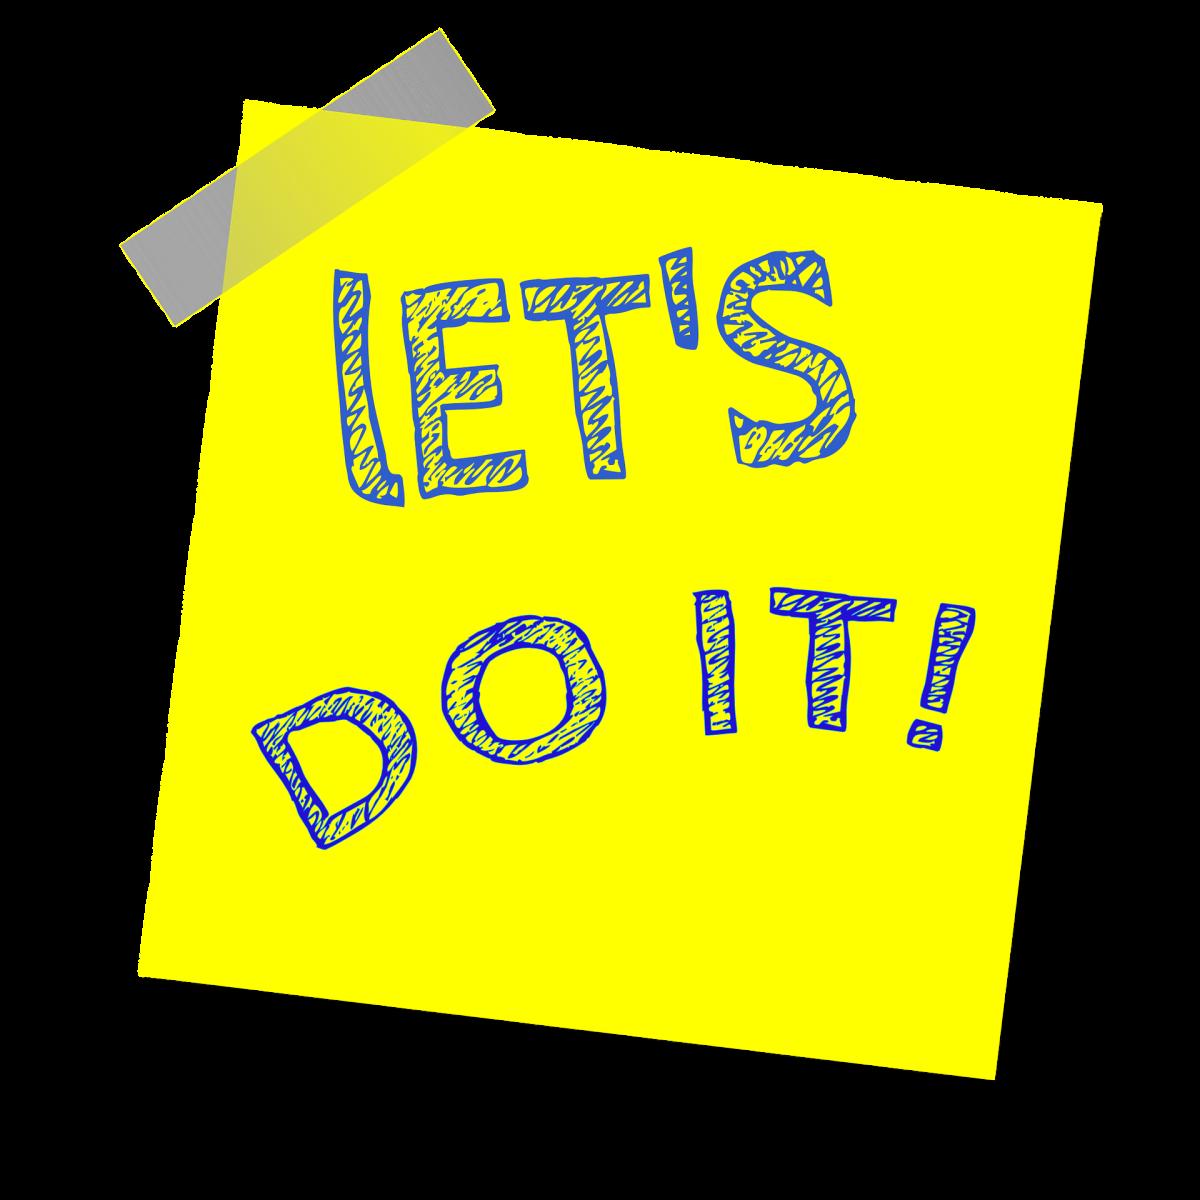 lets-do-it-1432952_1920